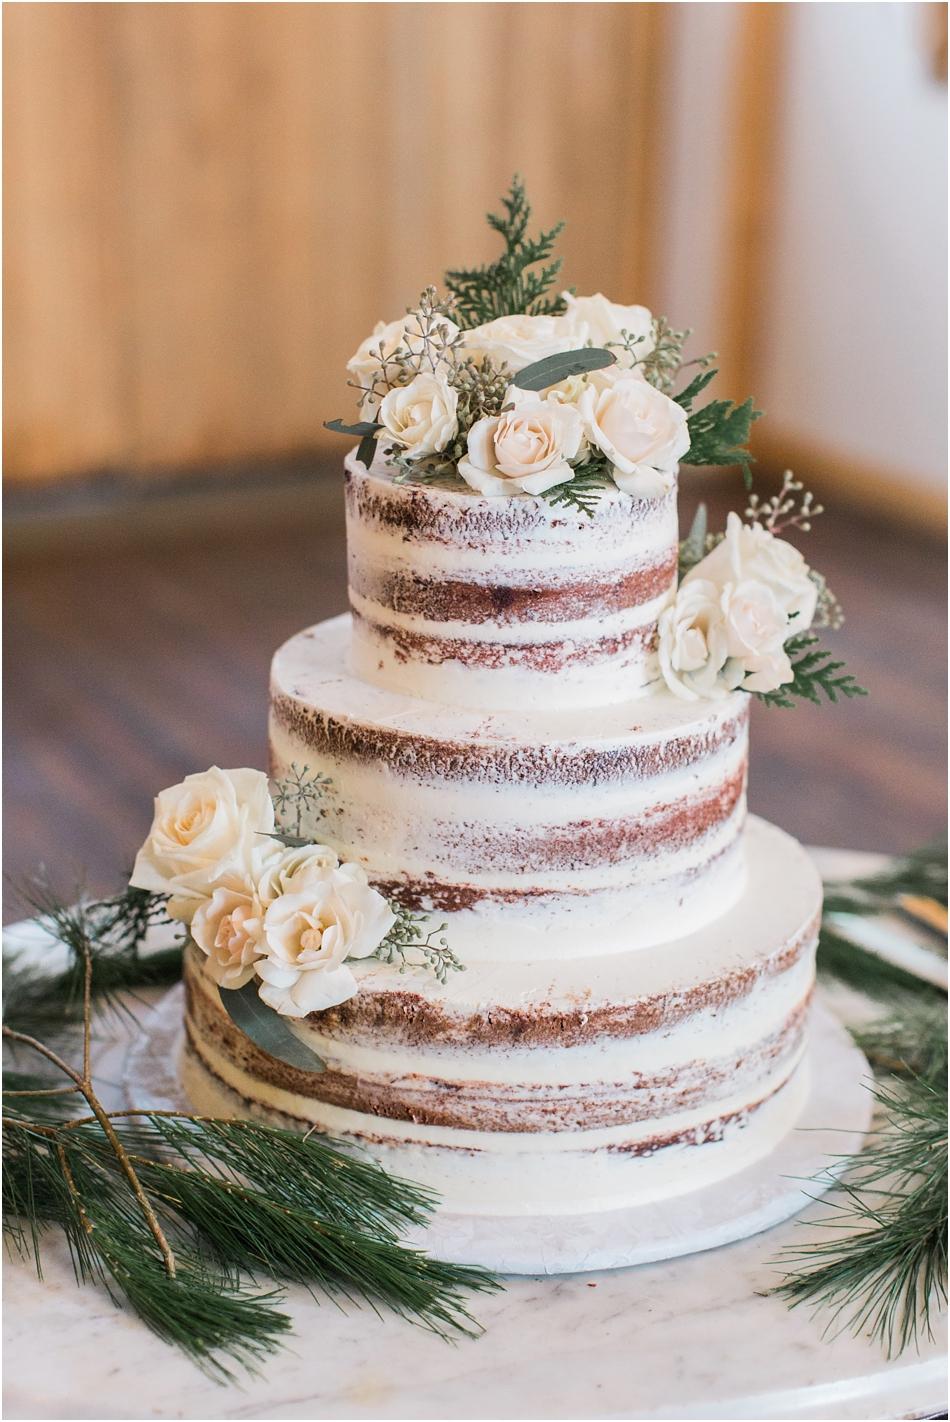 peirce_farm_winter_christmas_jessica_john_cape_cod_boston_new_england_wedding_photographer_Meredith_Jane_Photography_photo_0342.jpg